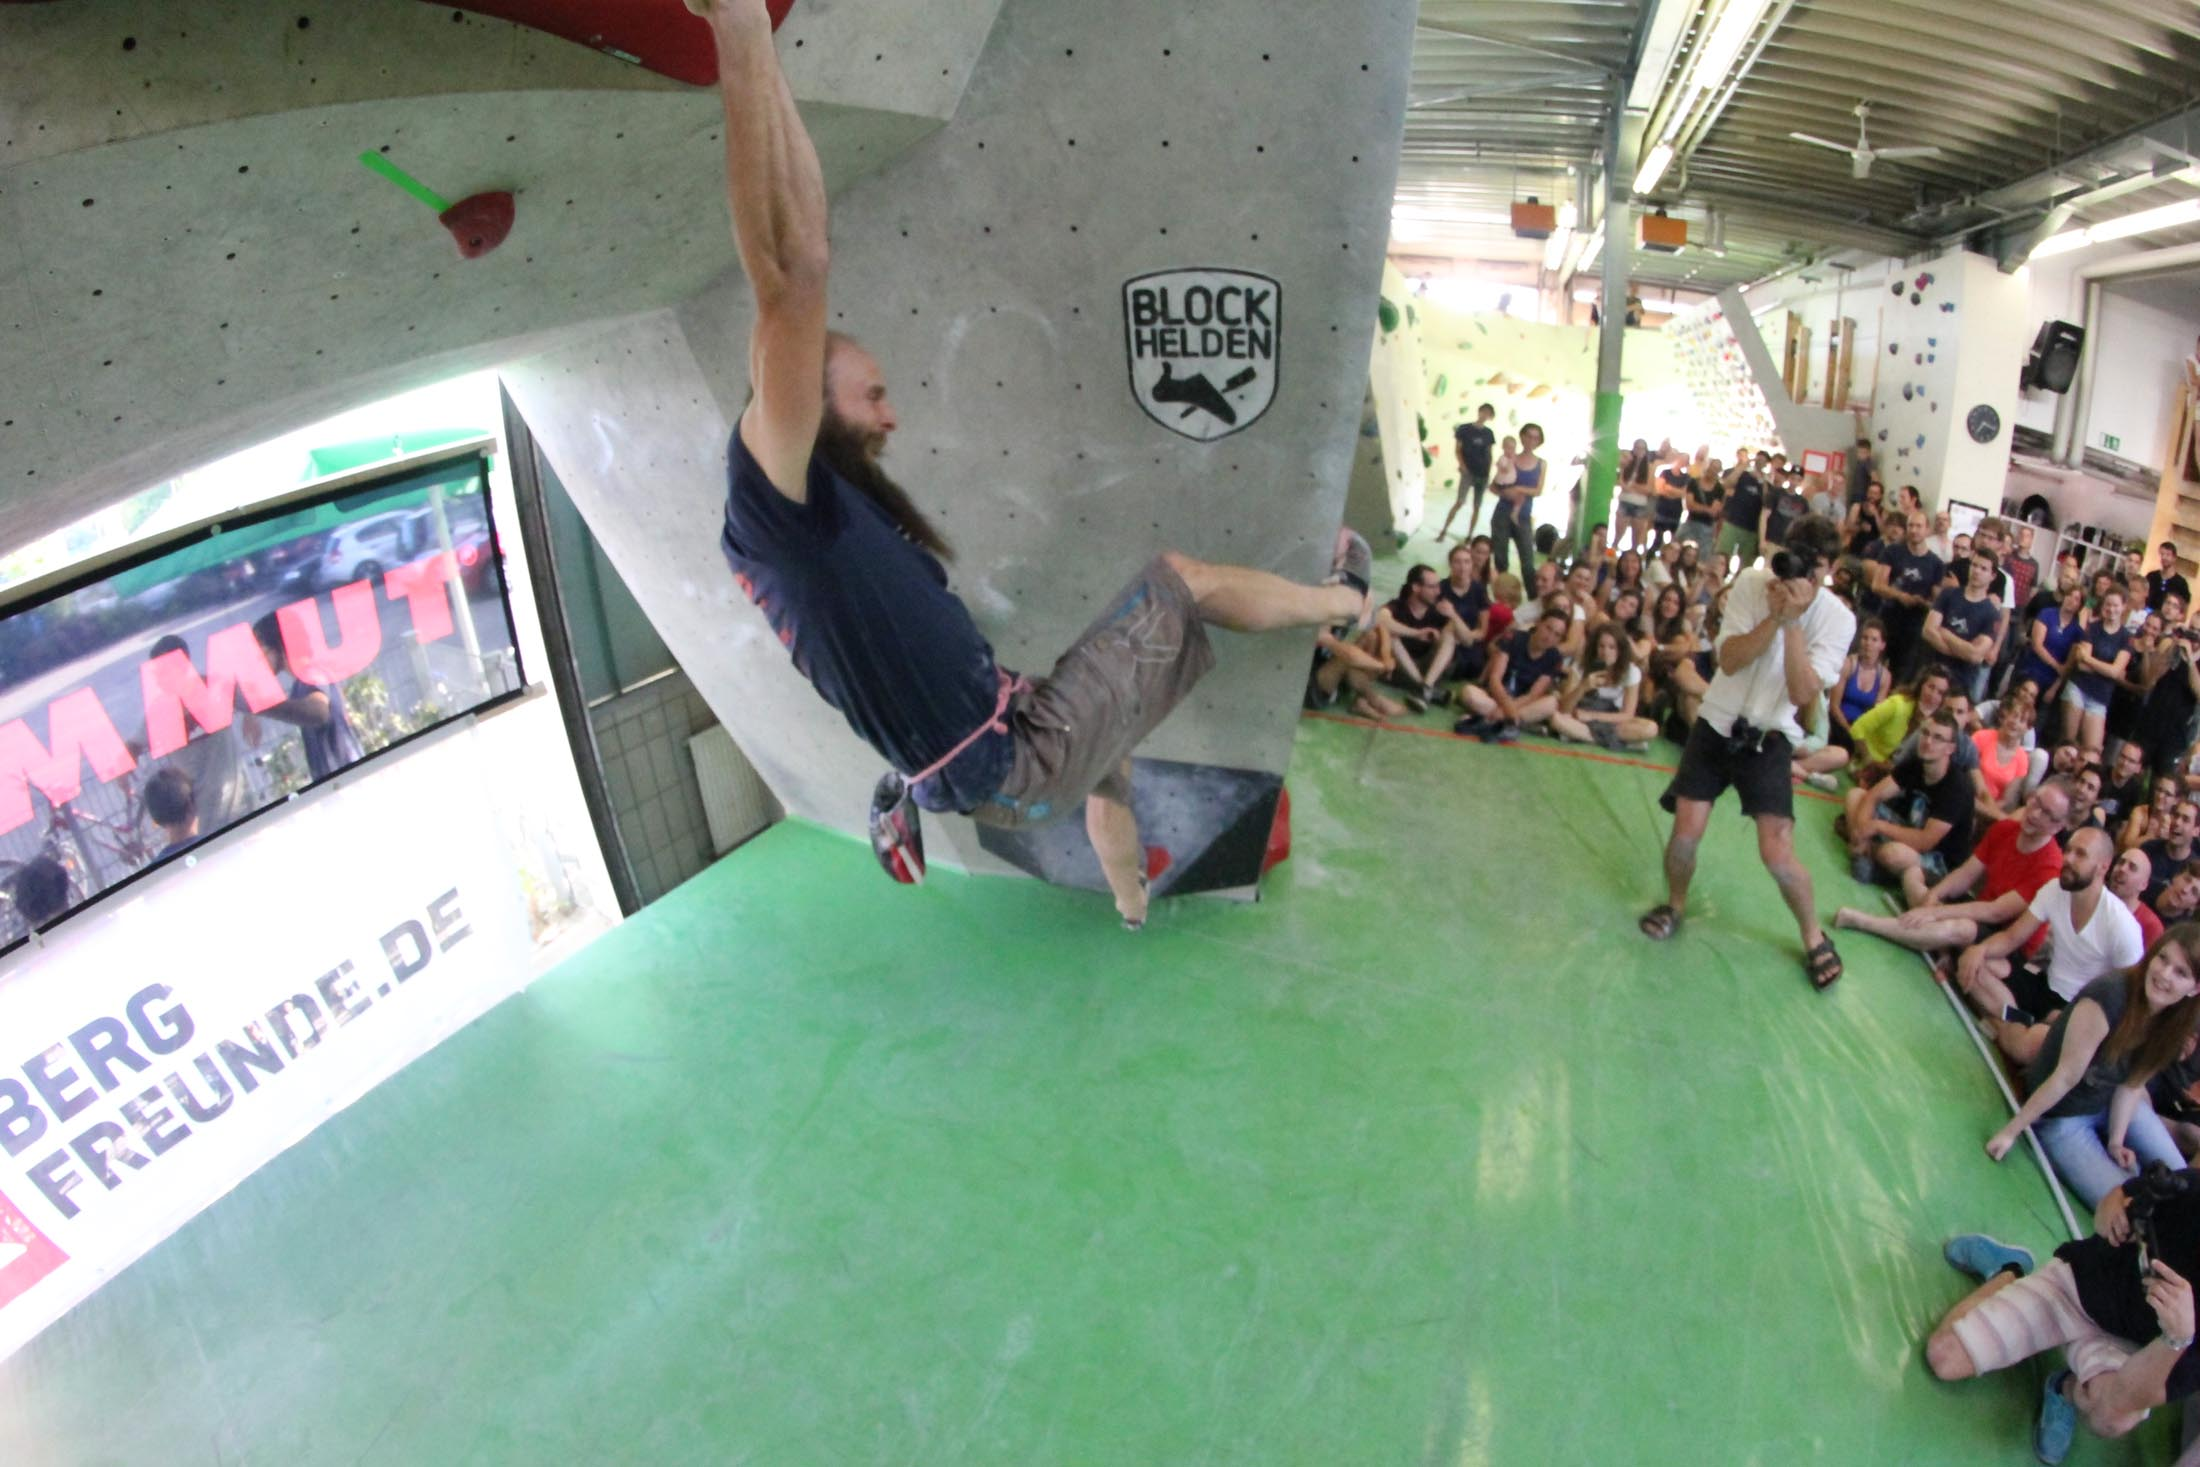 Finale, internationaler bouldercup Frankenjura 2016, BLOCKHELDEN Erlangen, Mammut, Bergfreunde.de, Boulderwettkampf07092016597